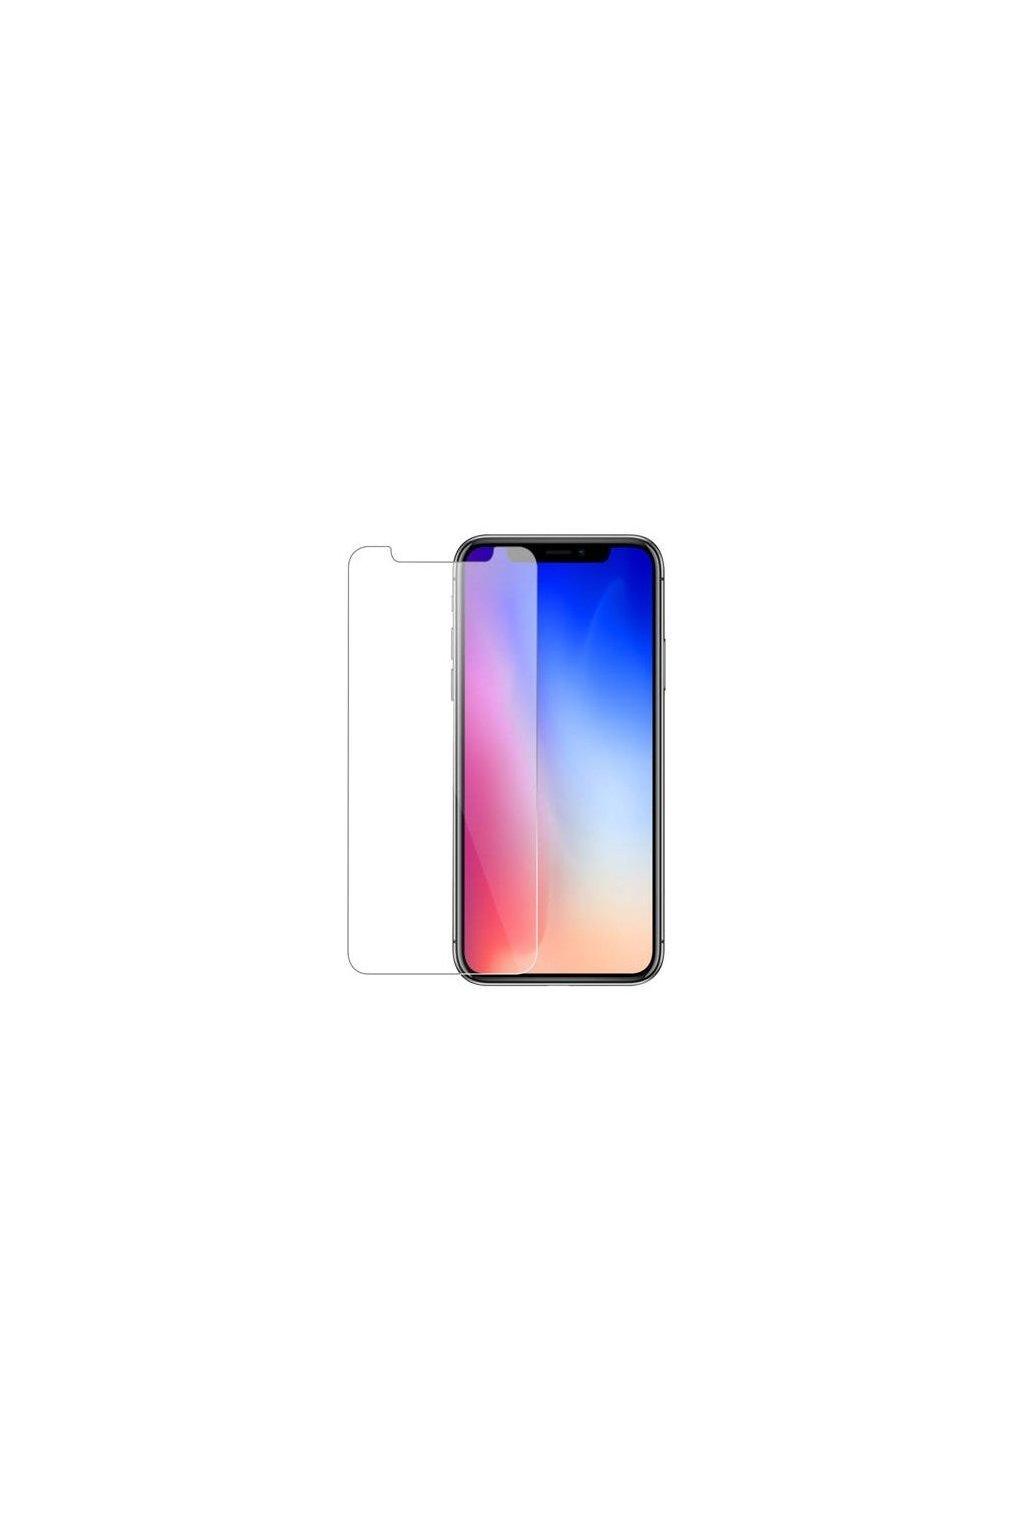 2156 pudini ochranne tvrzene sklo iphone xs max 11 pro max